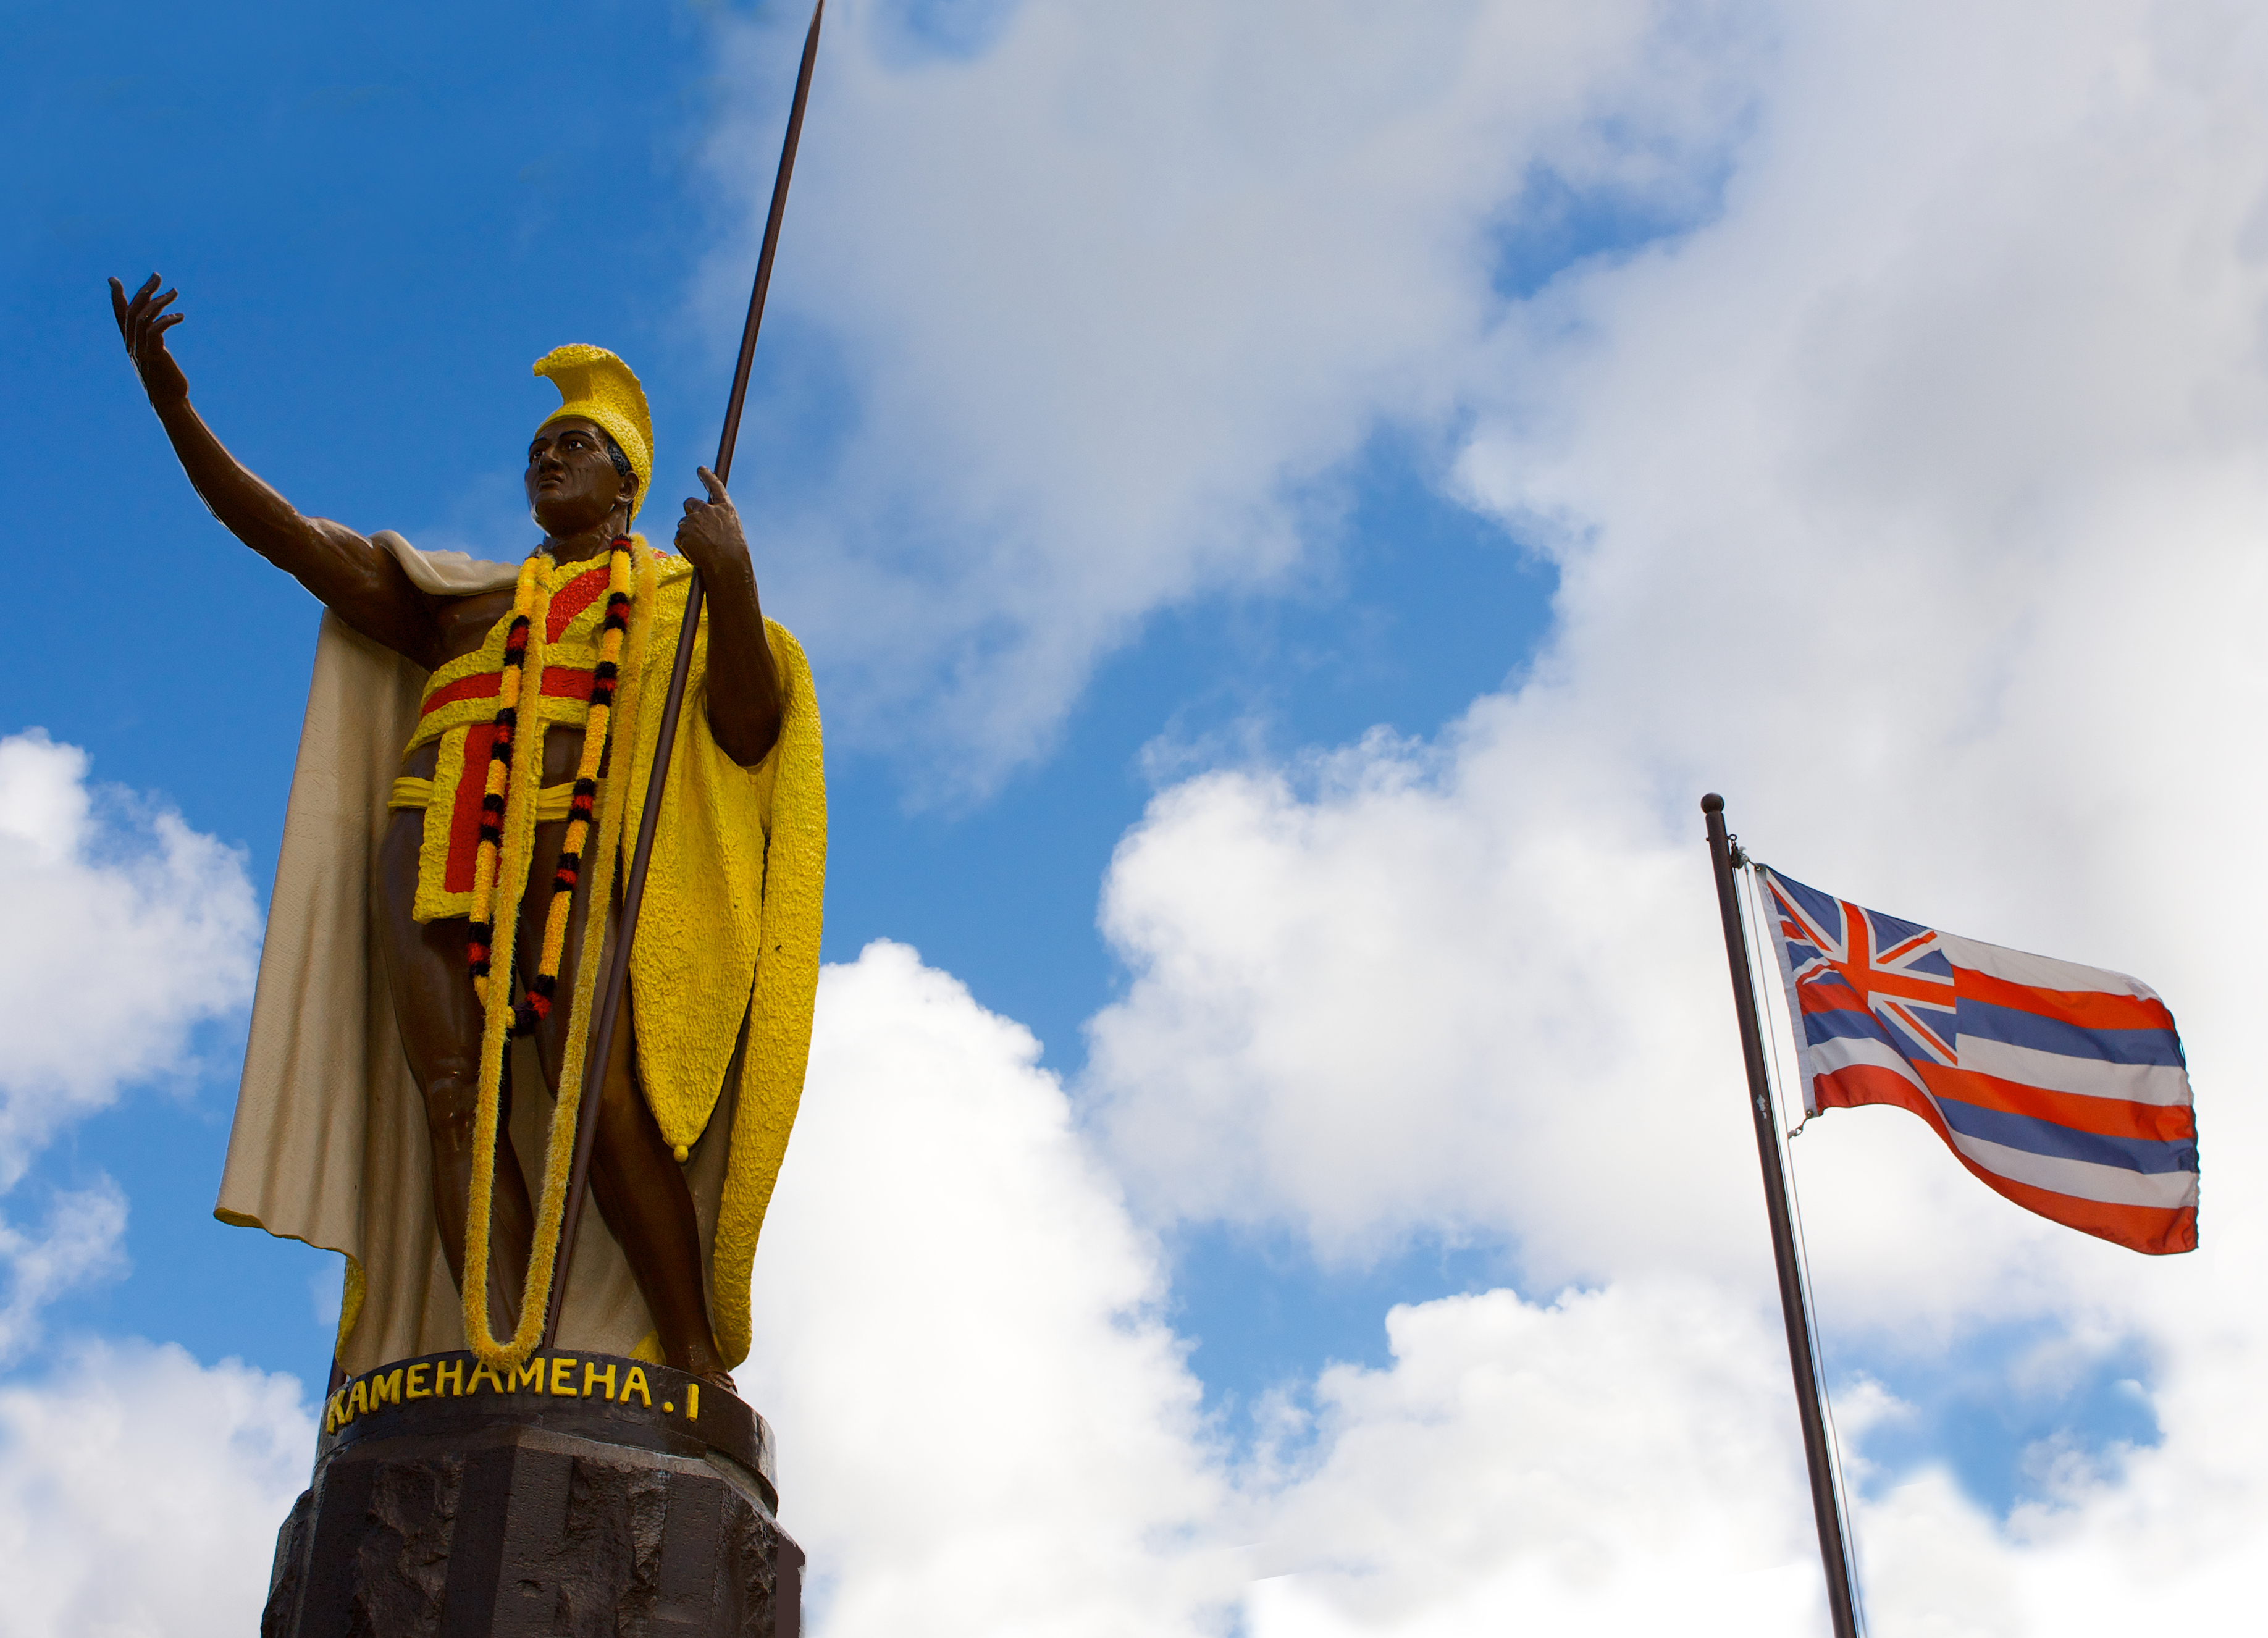 Kamehameha Statue and flag.jpg